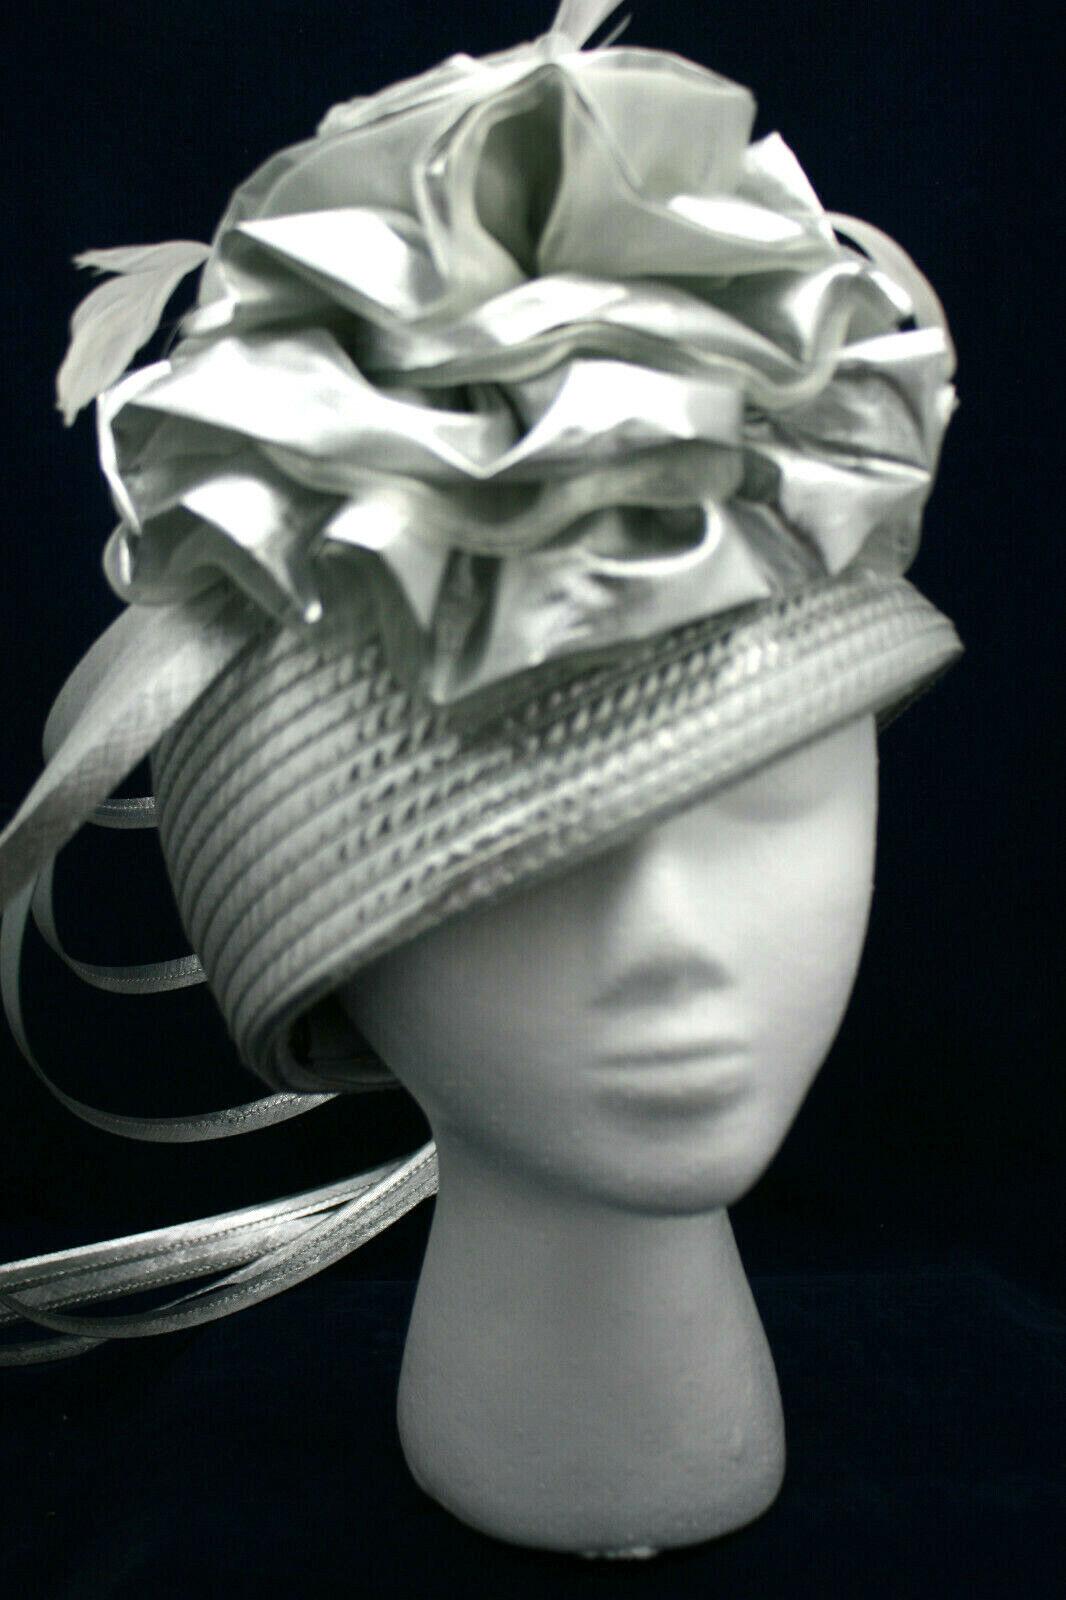 Ladies' Formal Headpiece Hat Whitall & Shon Wedding Church Derby Silver 22.5